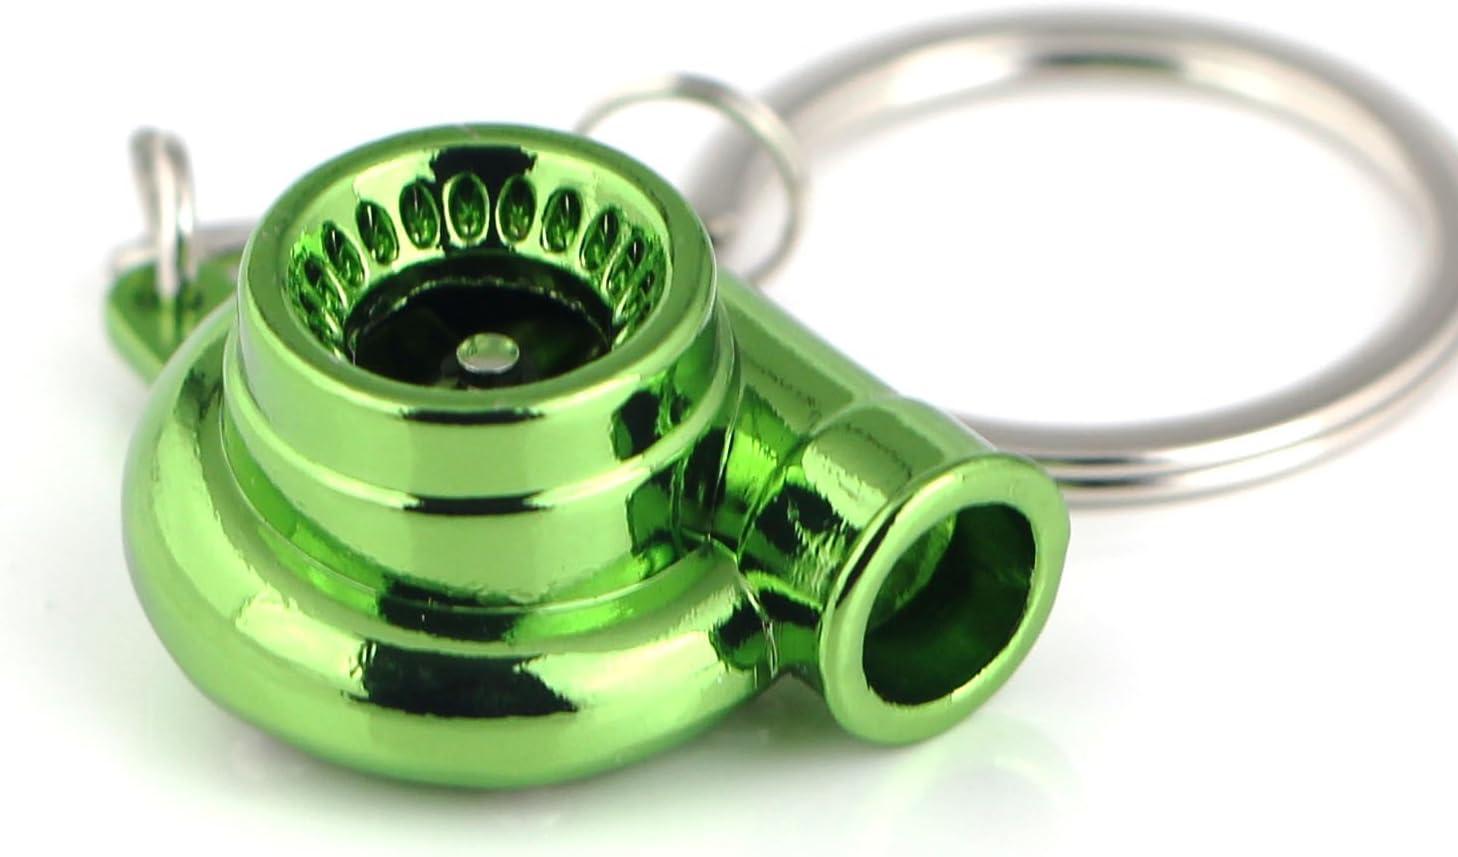 Maycom Creative Spinning New Turbo Turbocharger Keychain Key Chain Ring Keyring Keyfob (Anodized Green)